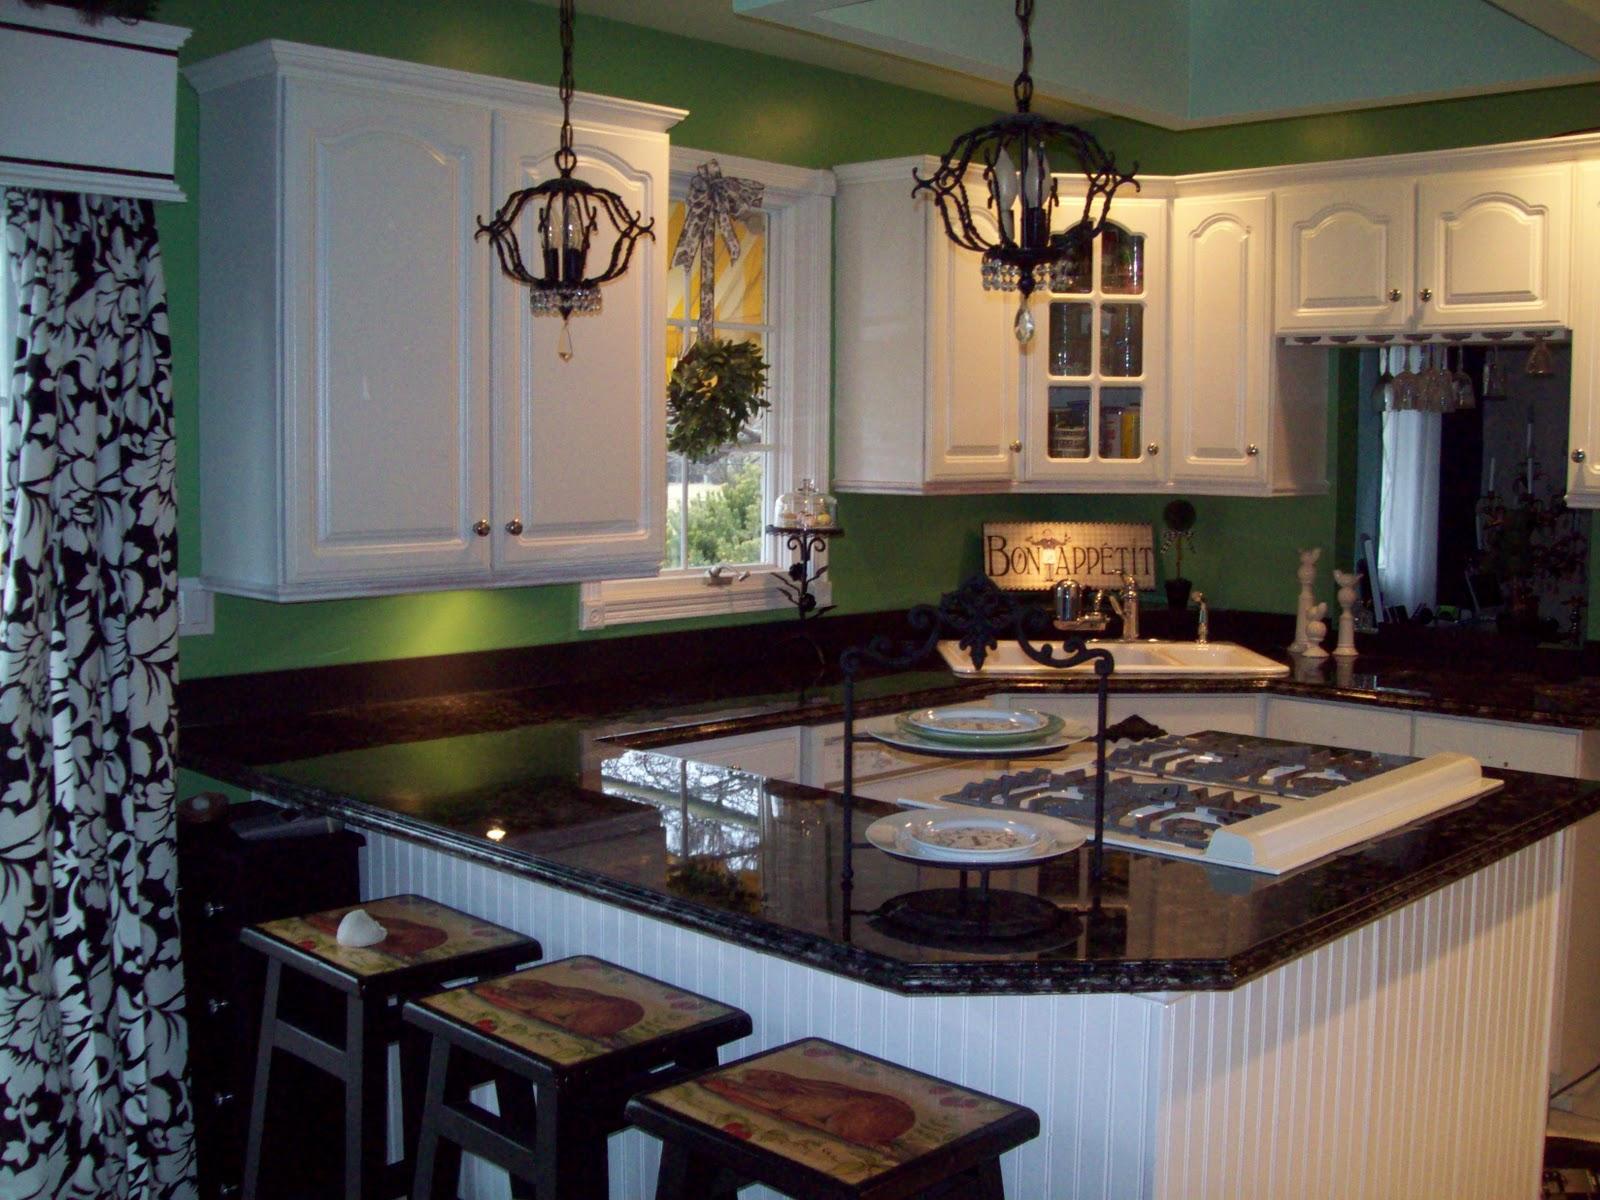 laminate countertops paint formica kitchen countertops Remodelaholic Painted Formica Countertop